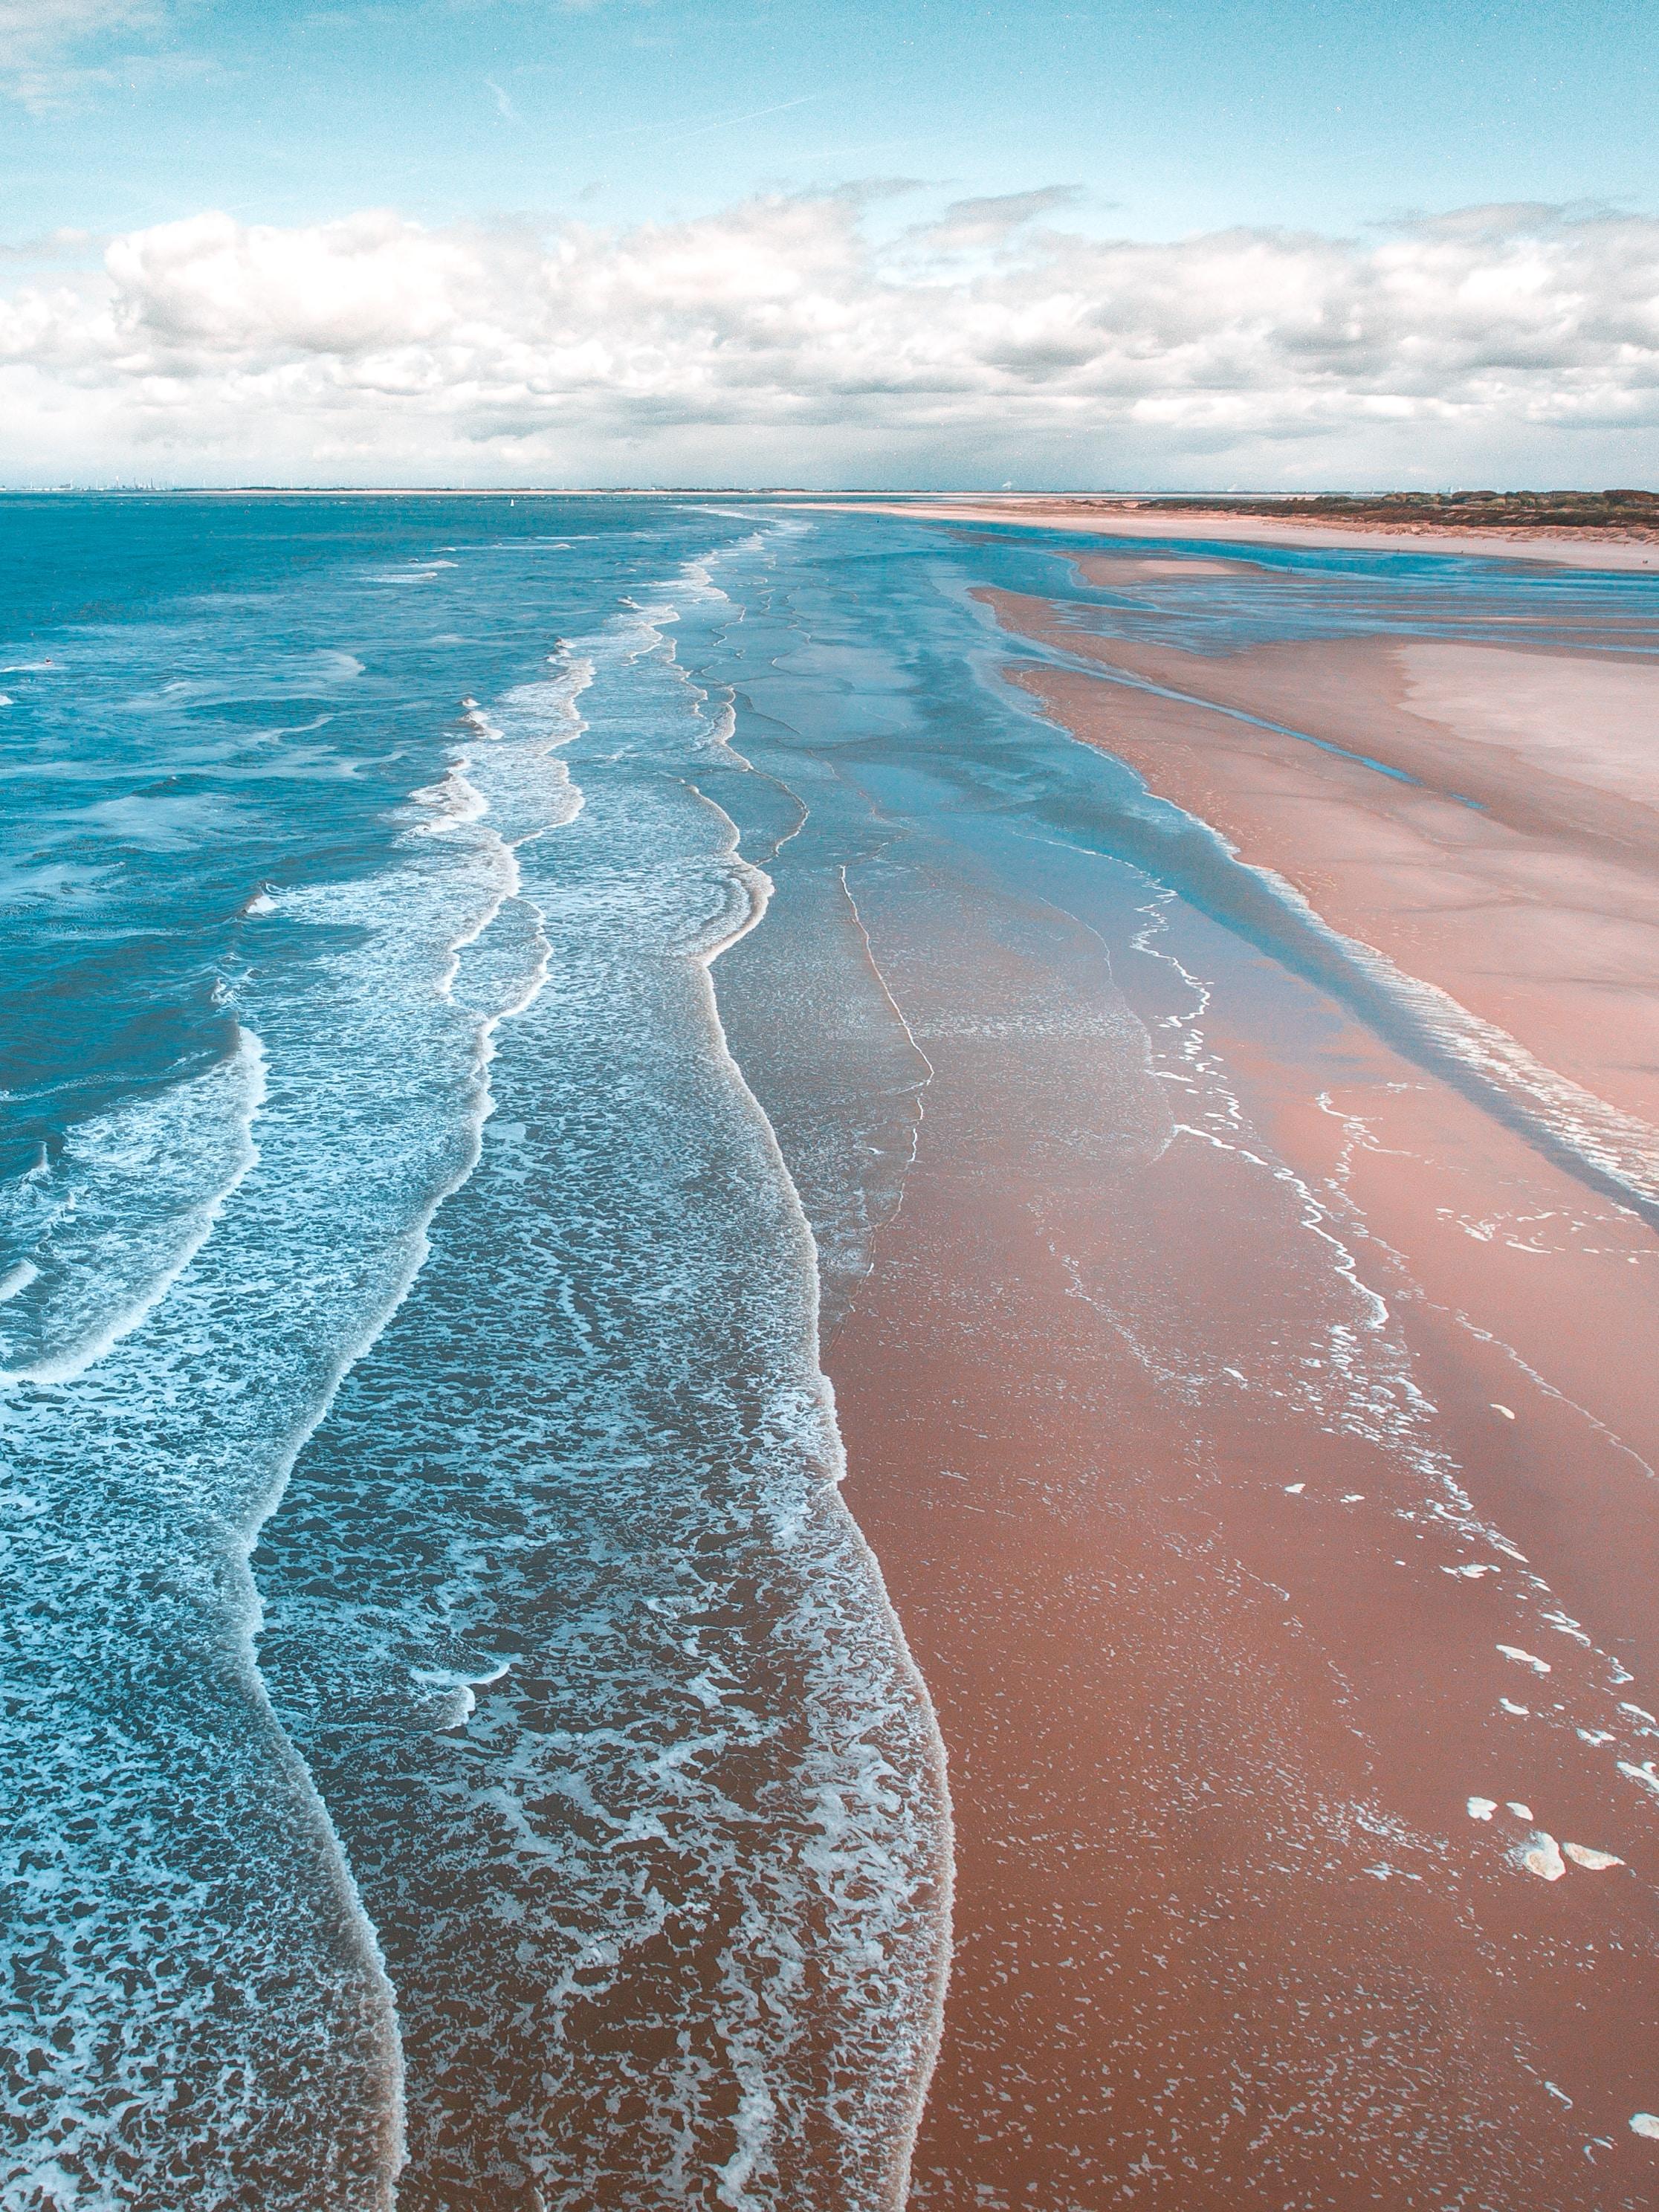 Free Fall Animal Wallpaper Download Beach Wallpapers Unsplash